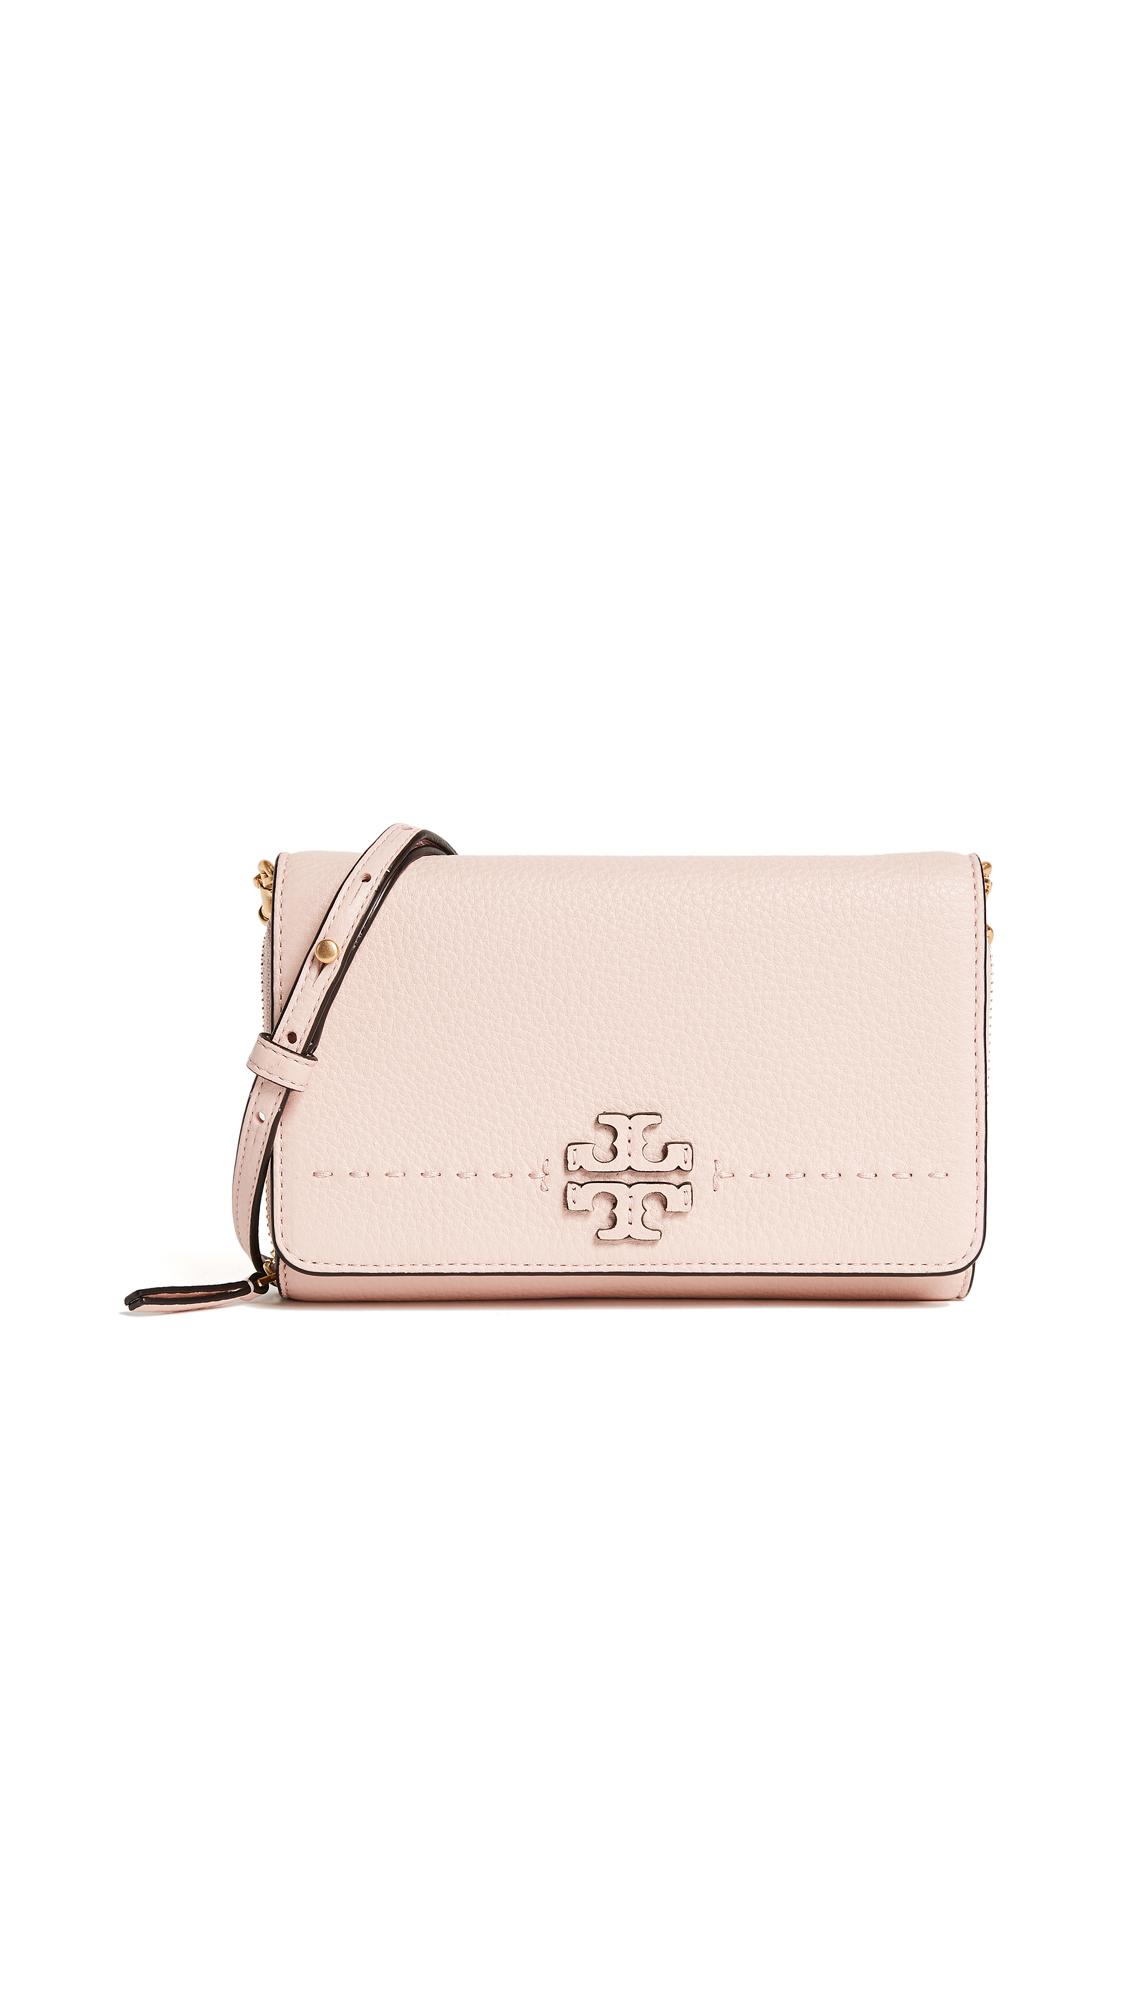 Tory Burch Mcgraw Flat Wallet Cross Body Bag - Pink Quartz